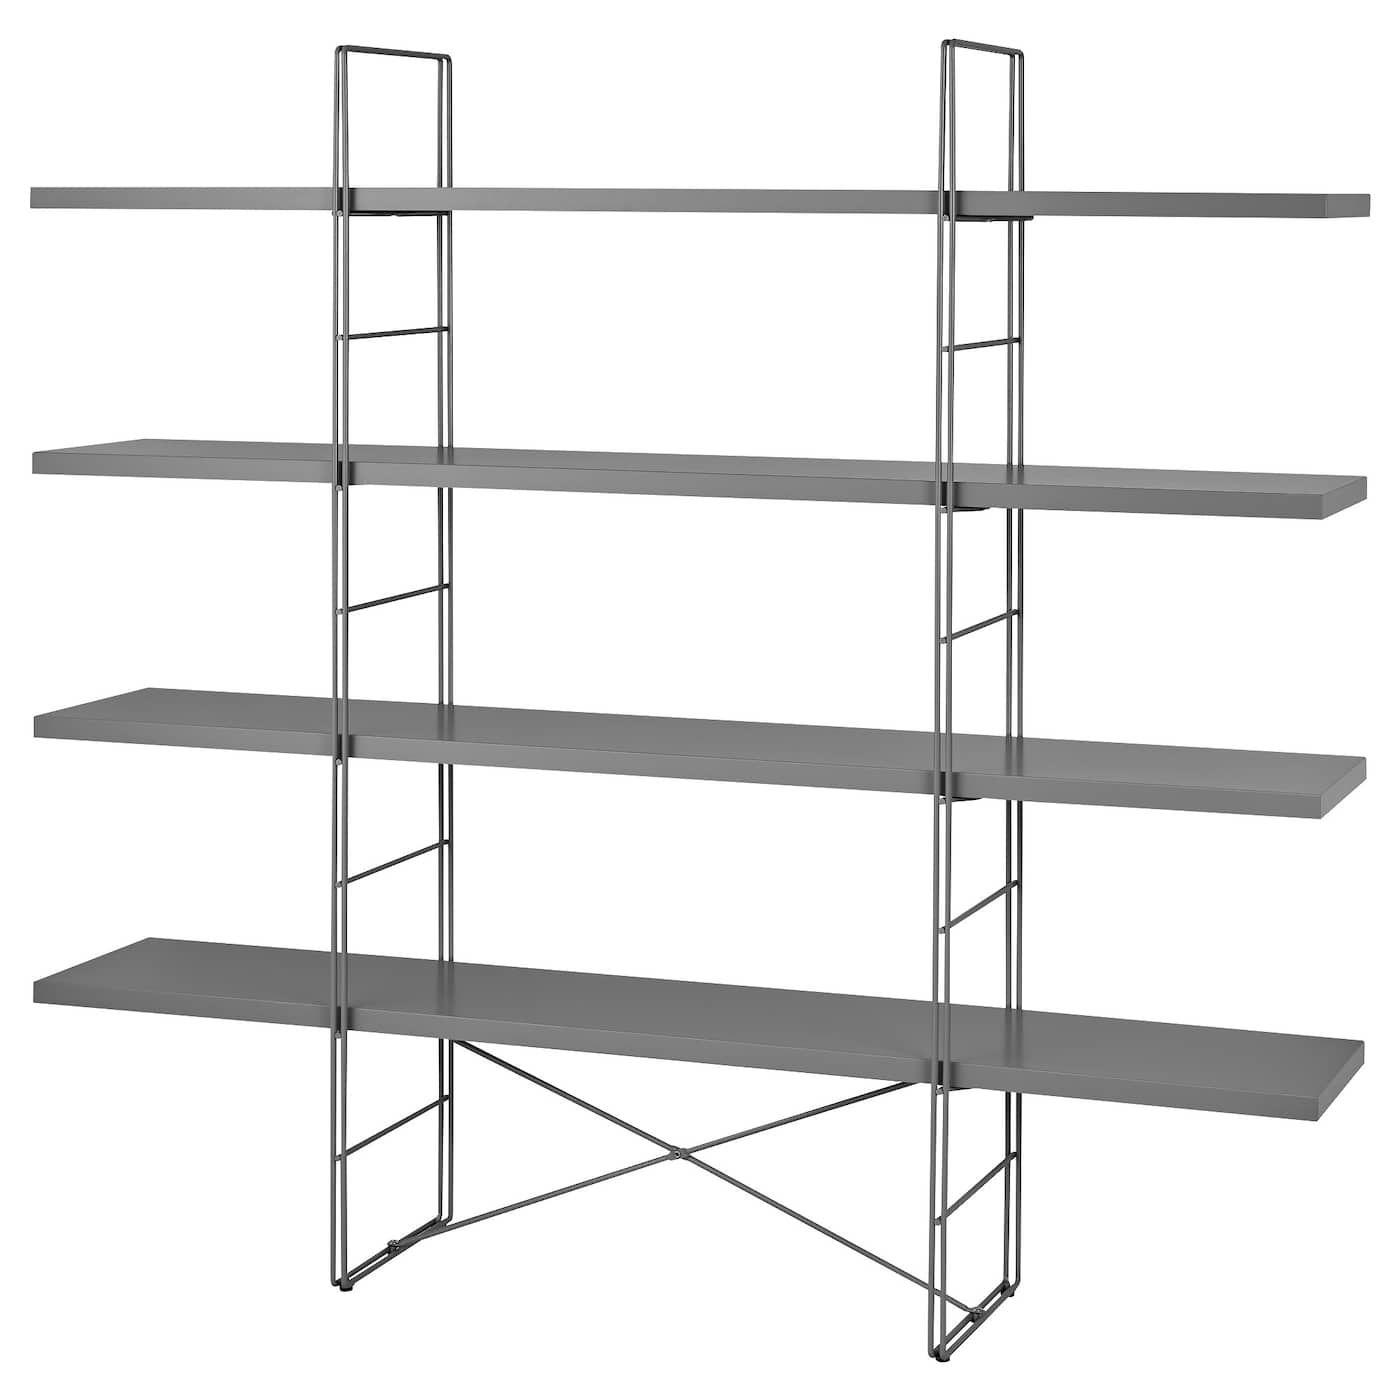 Enetri Regal Grau Regal Ikea Und Schrankwand